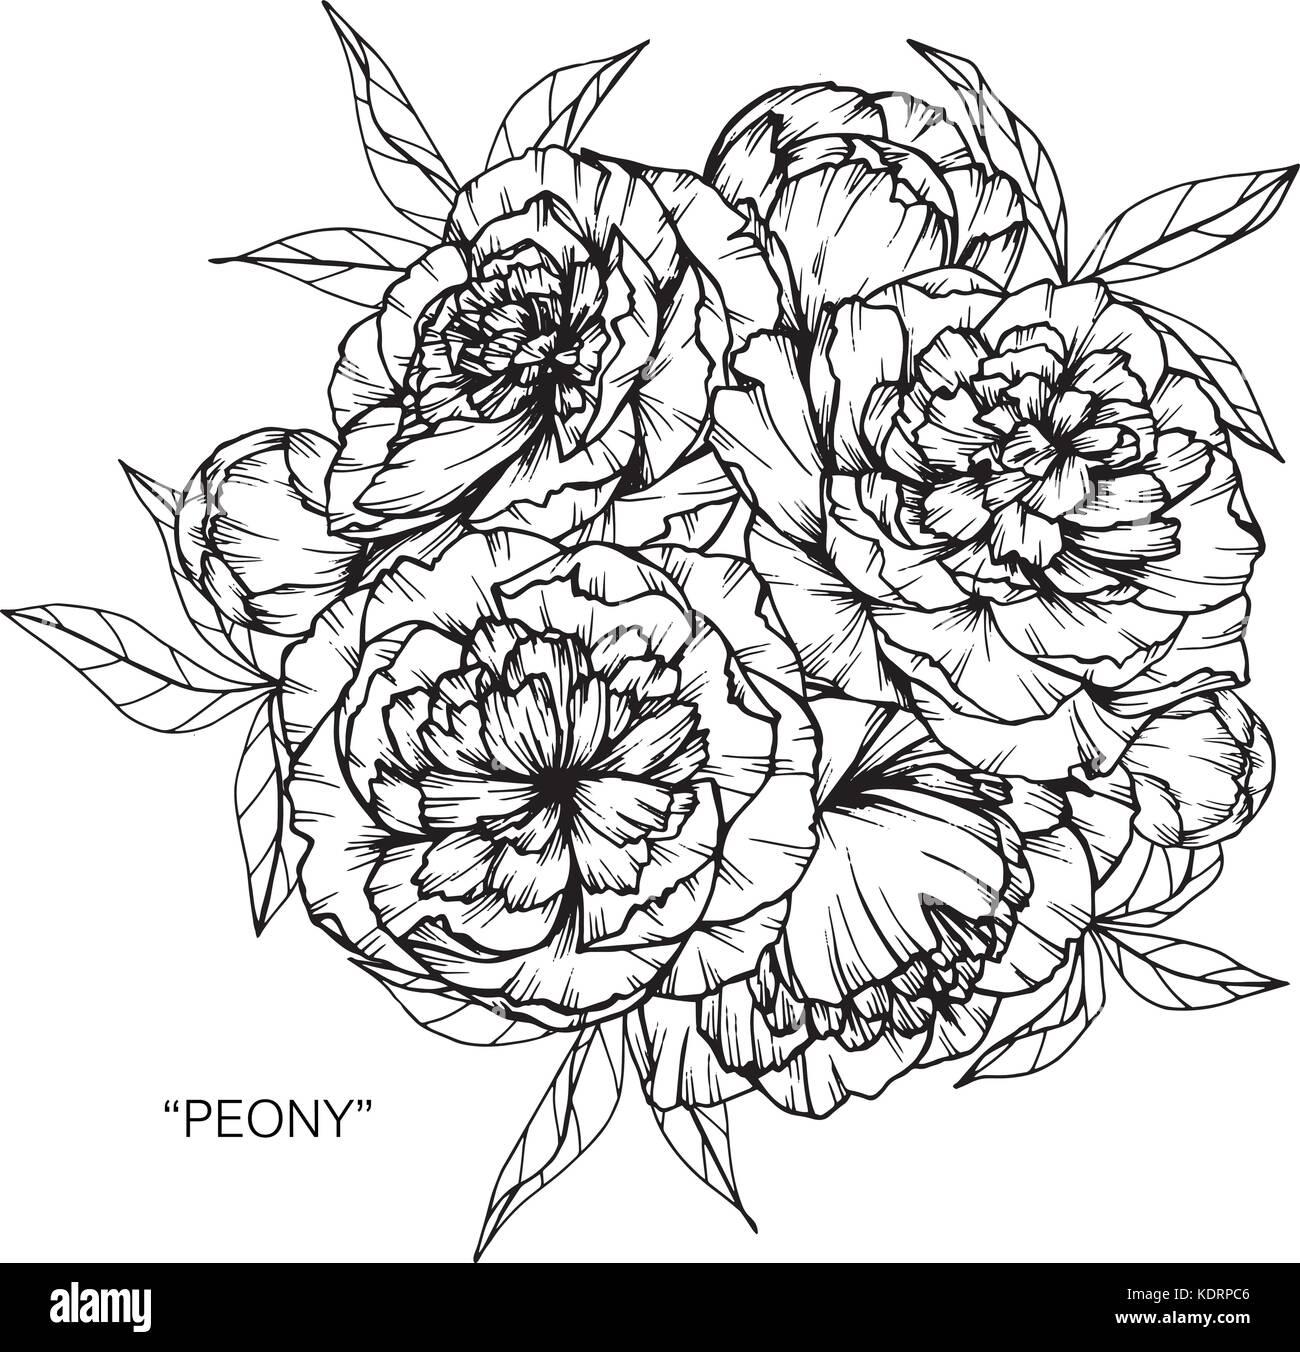 Bouquet of peony flowers drawing stock vector art illustration bouquet of peony flowers drawing izmirmasajfo